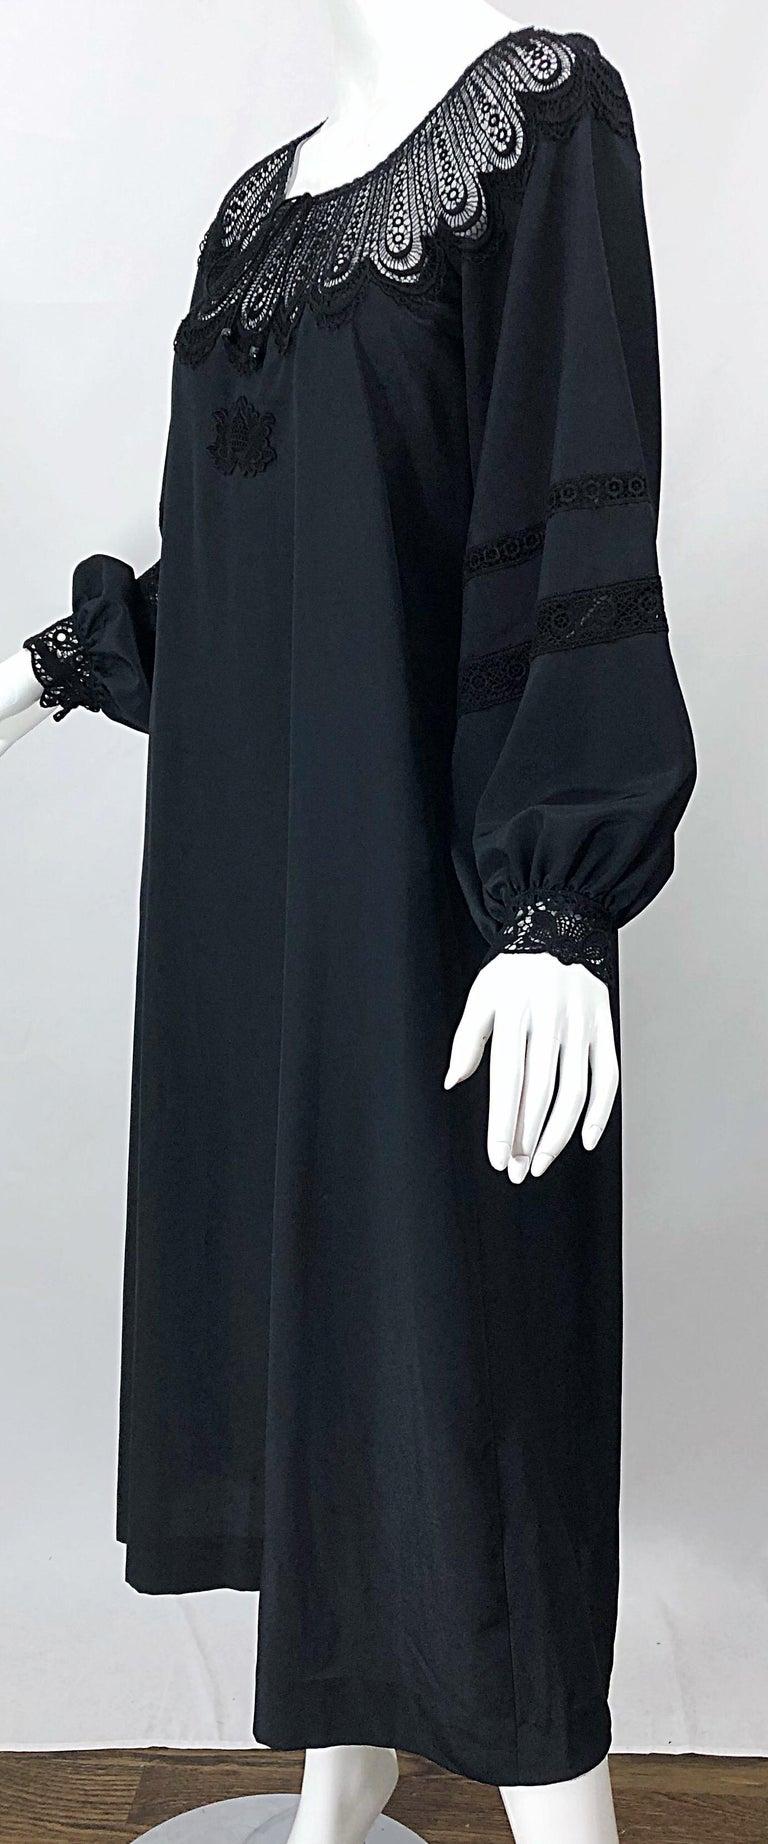 1970s Giorgio di Sant Angelo Black Vintage 70s Crochet Bishop Sleeve Smock Dress For Sale 2